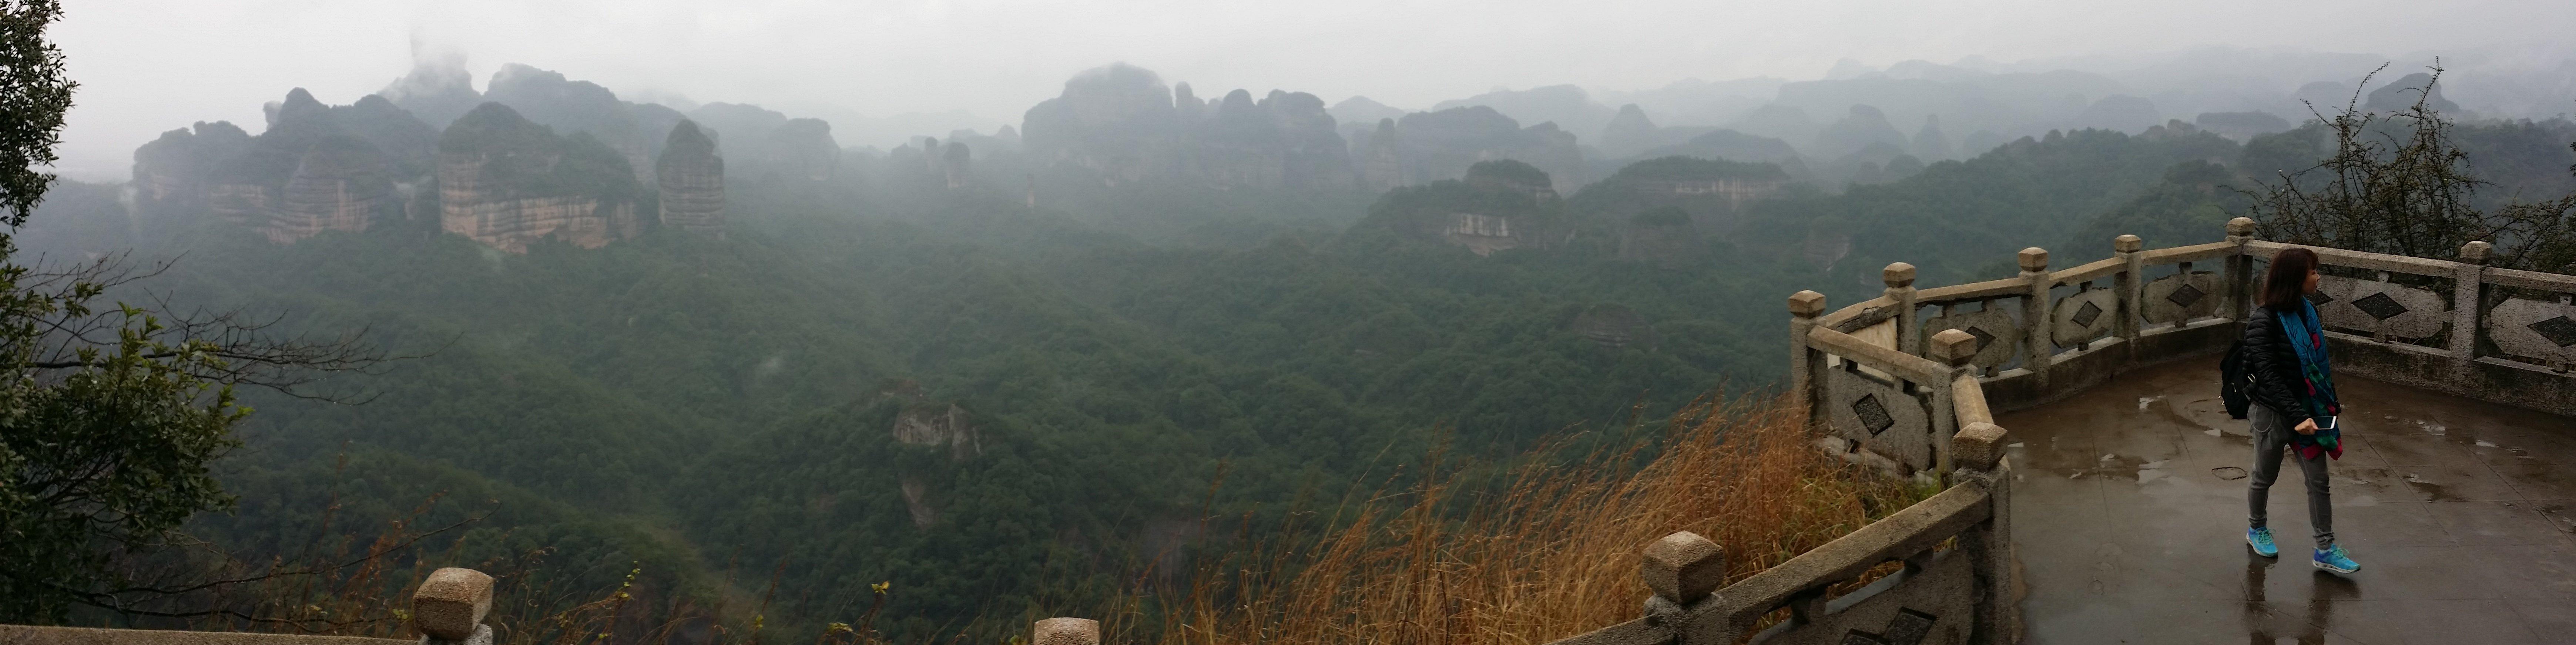 Renhua County